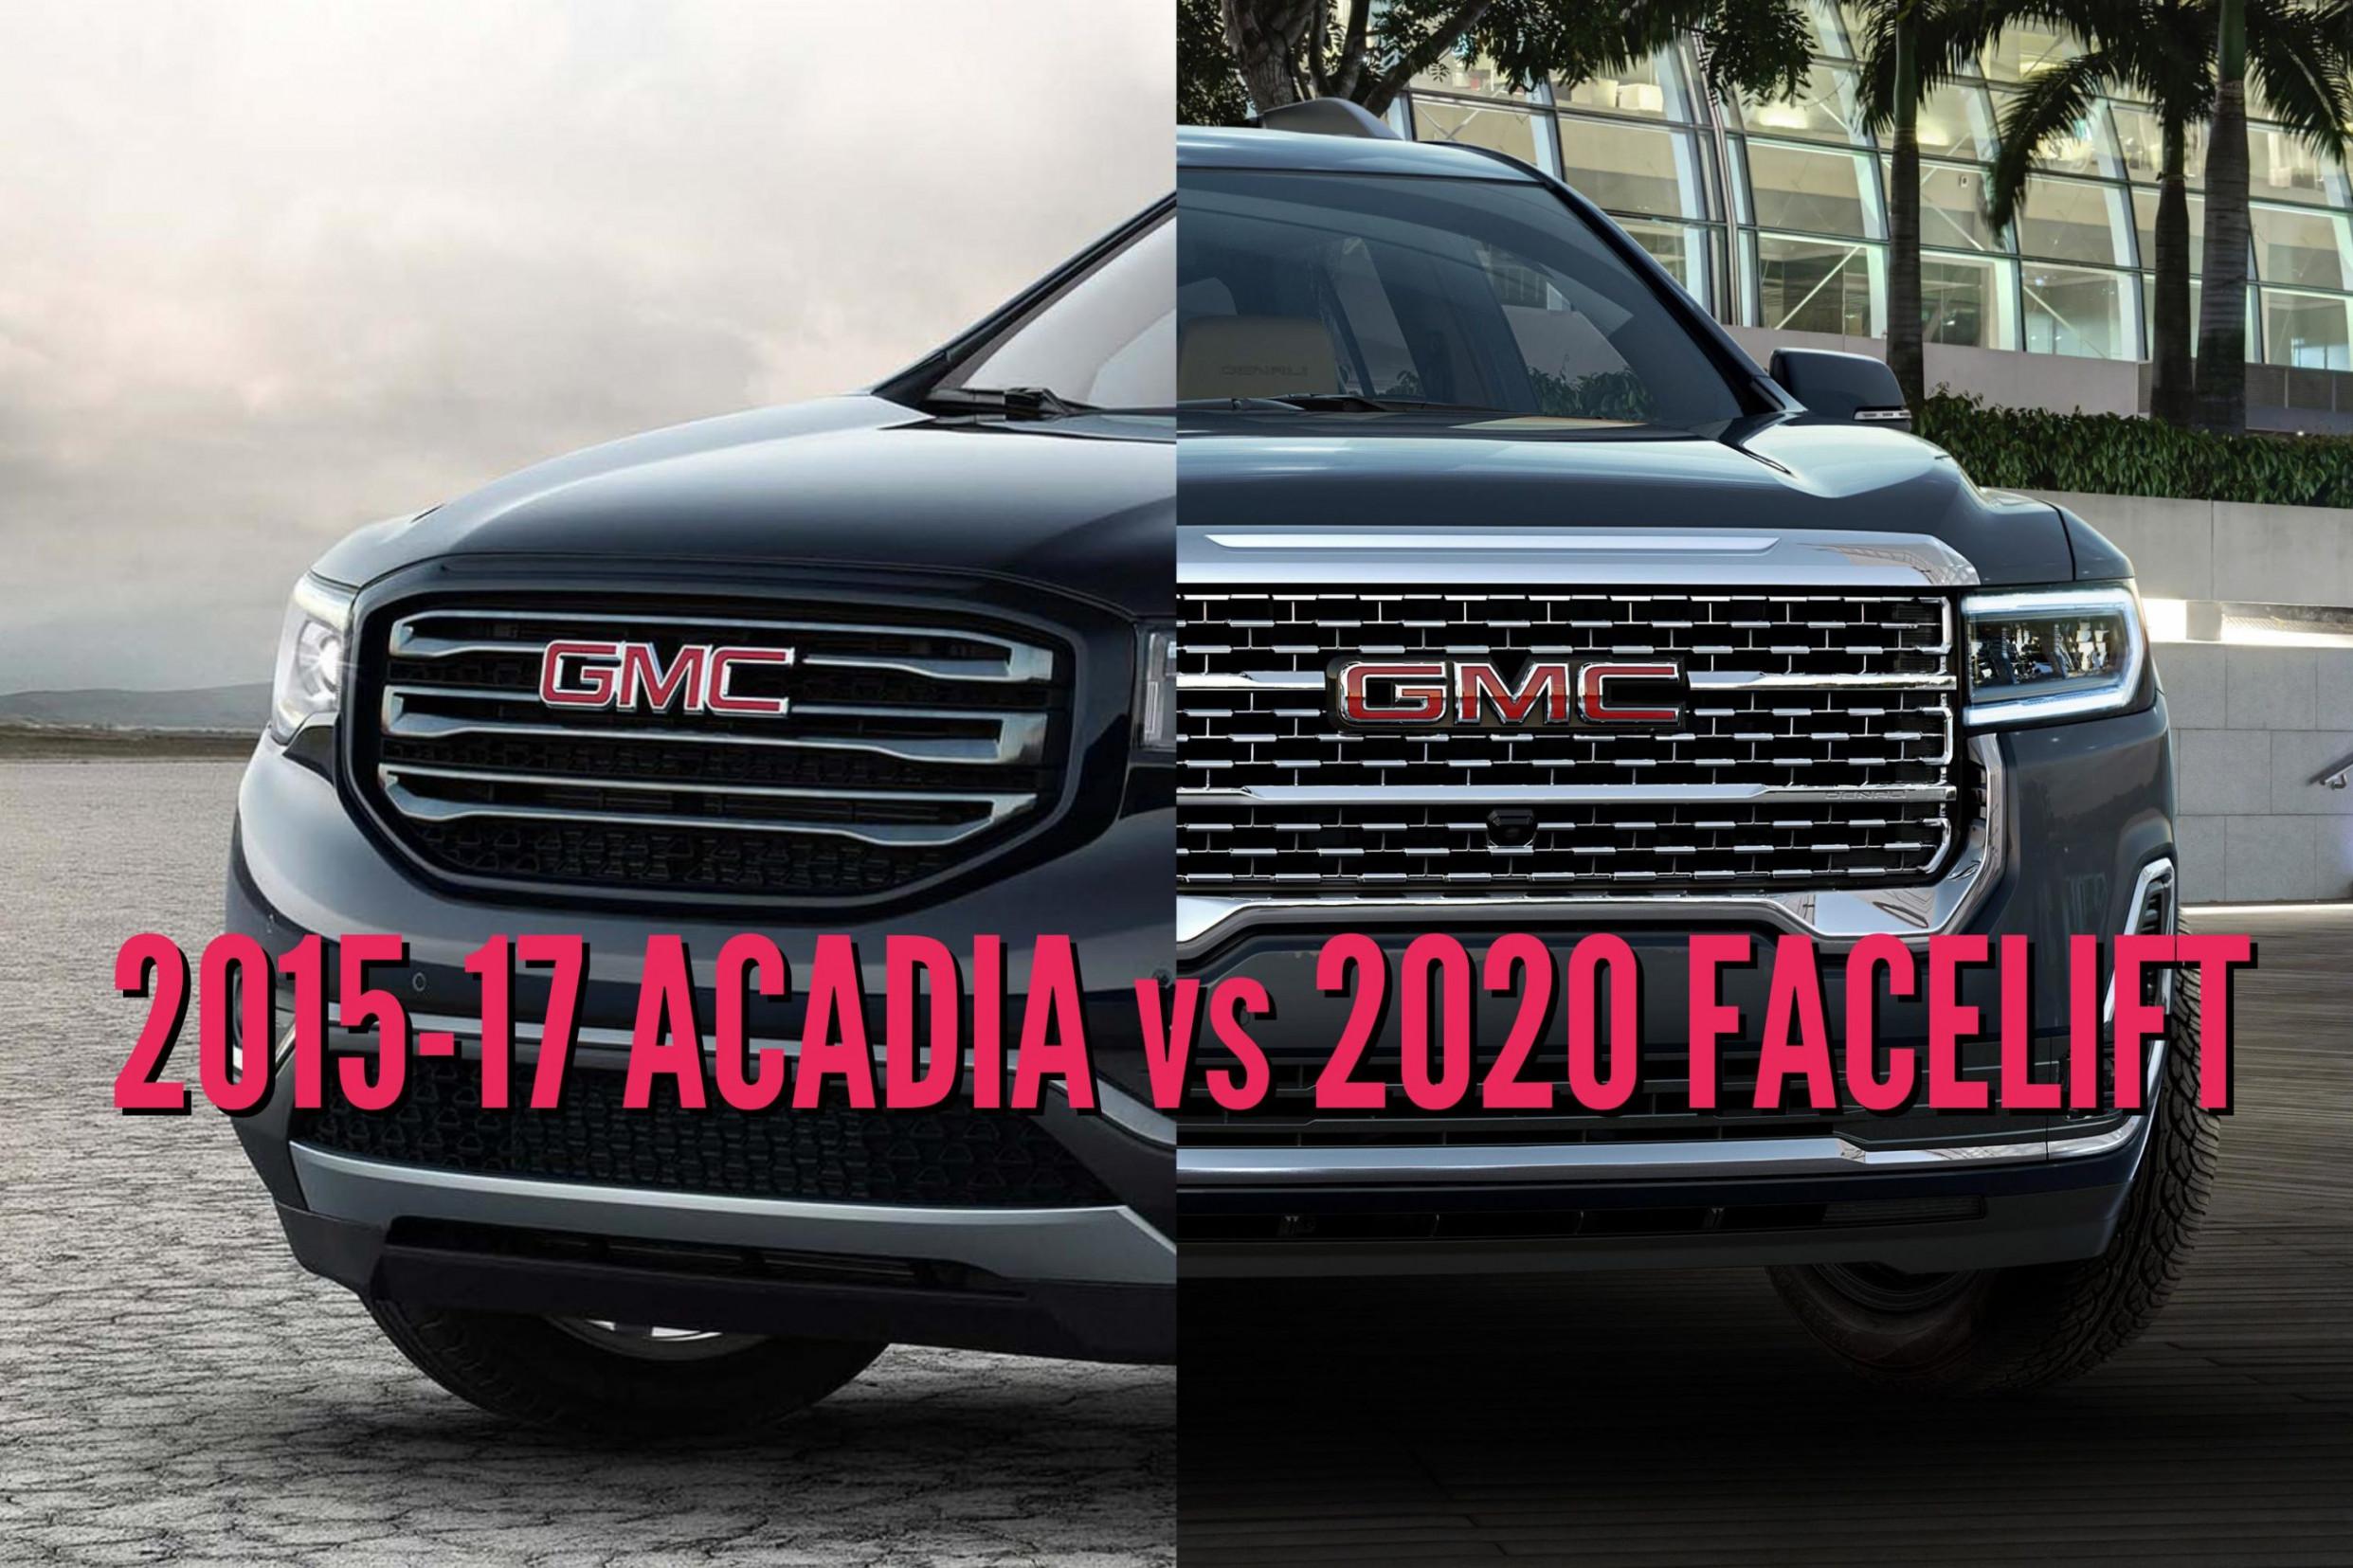 Release Gmc Acadia 2022 Vs 2019